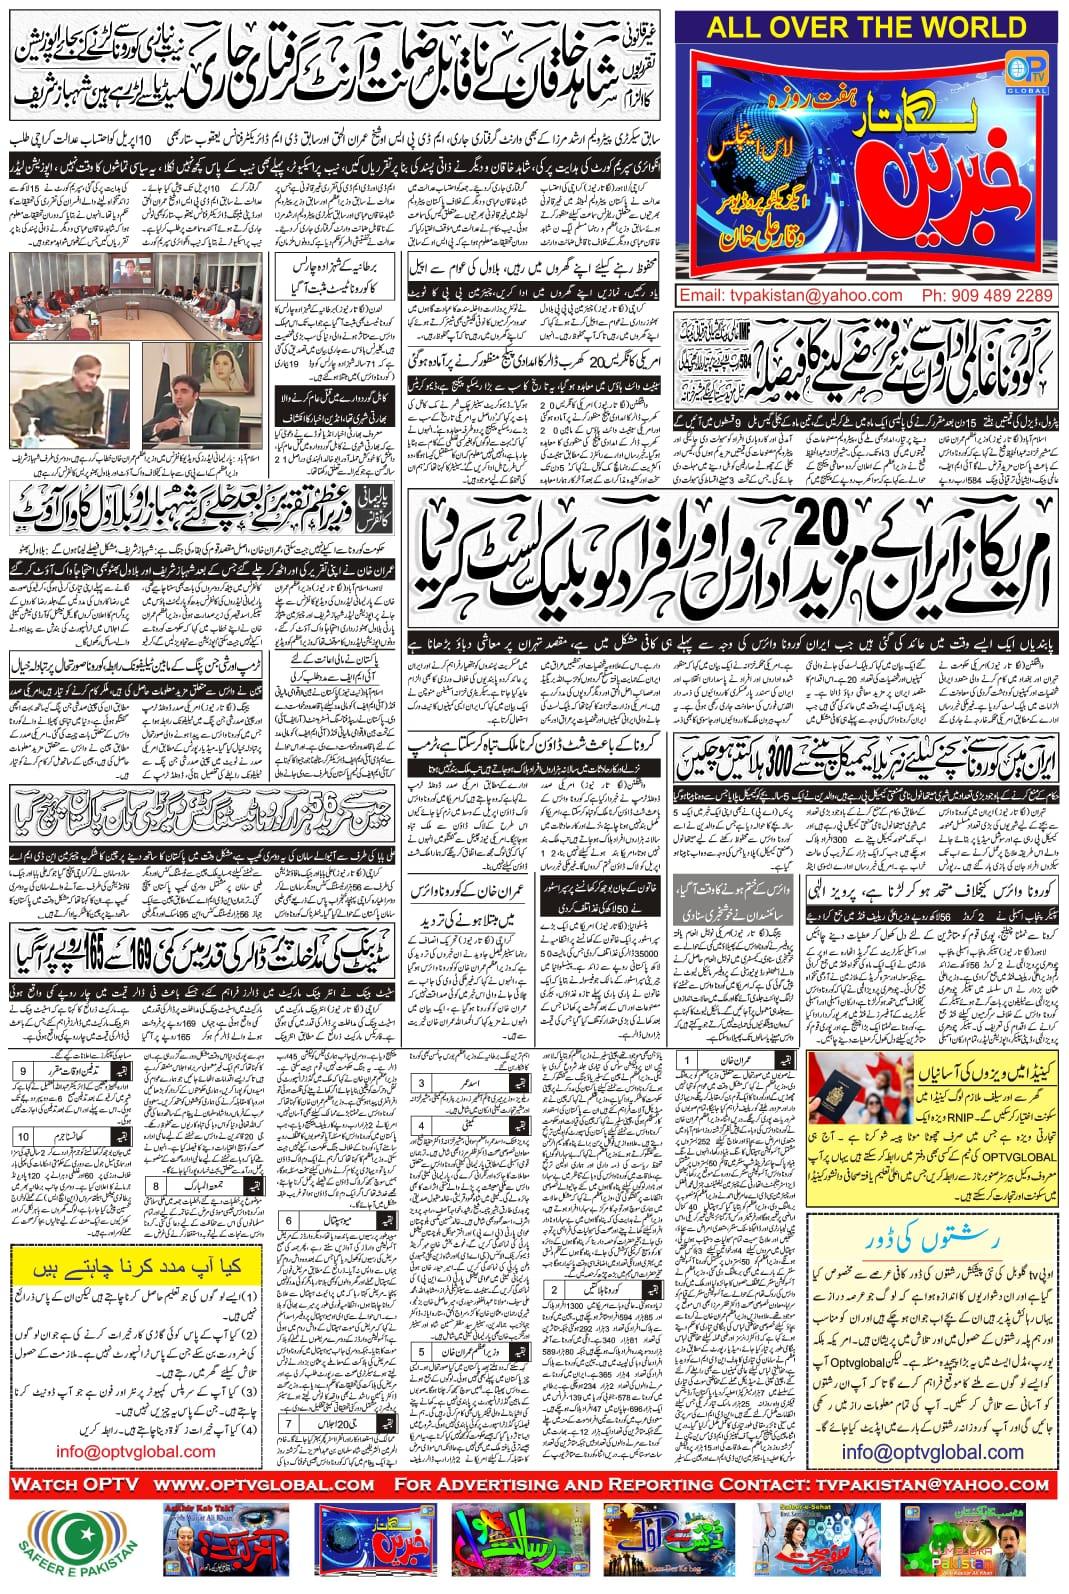 Newspaper 28 March